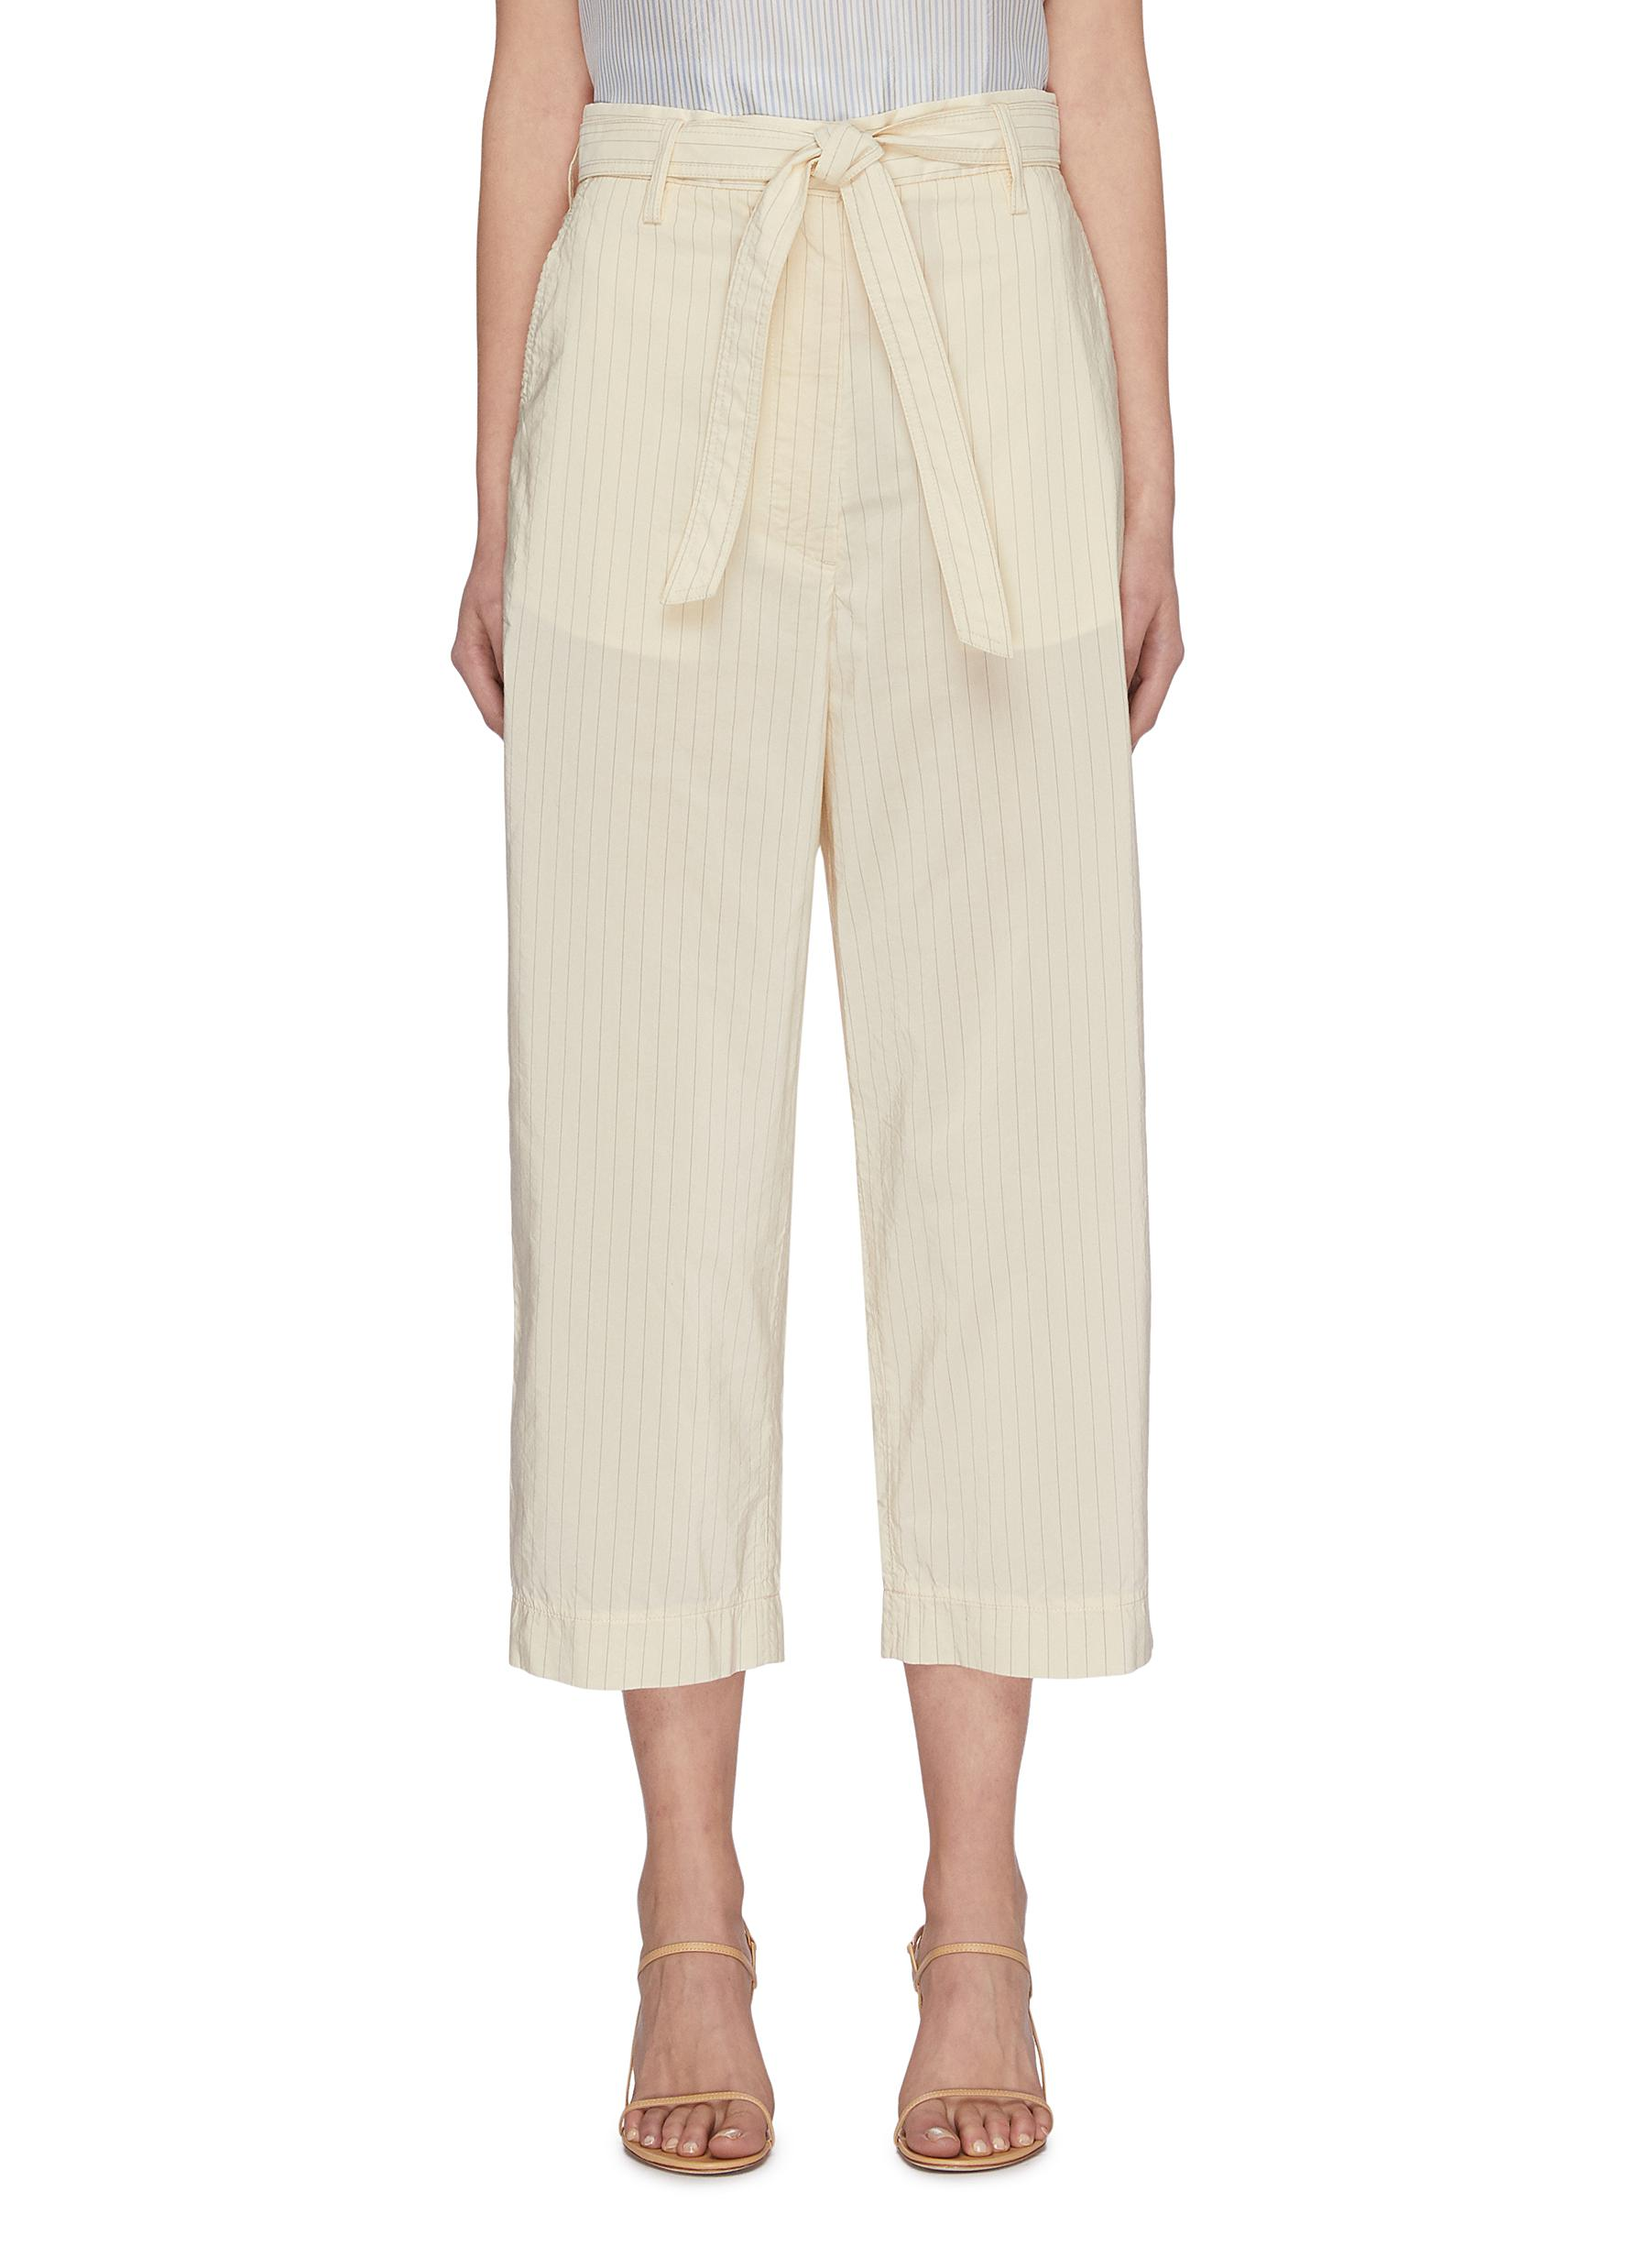 Buy Barena Pants & Shorts 'Giuditta Gess Cupro' tie waist chino pants